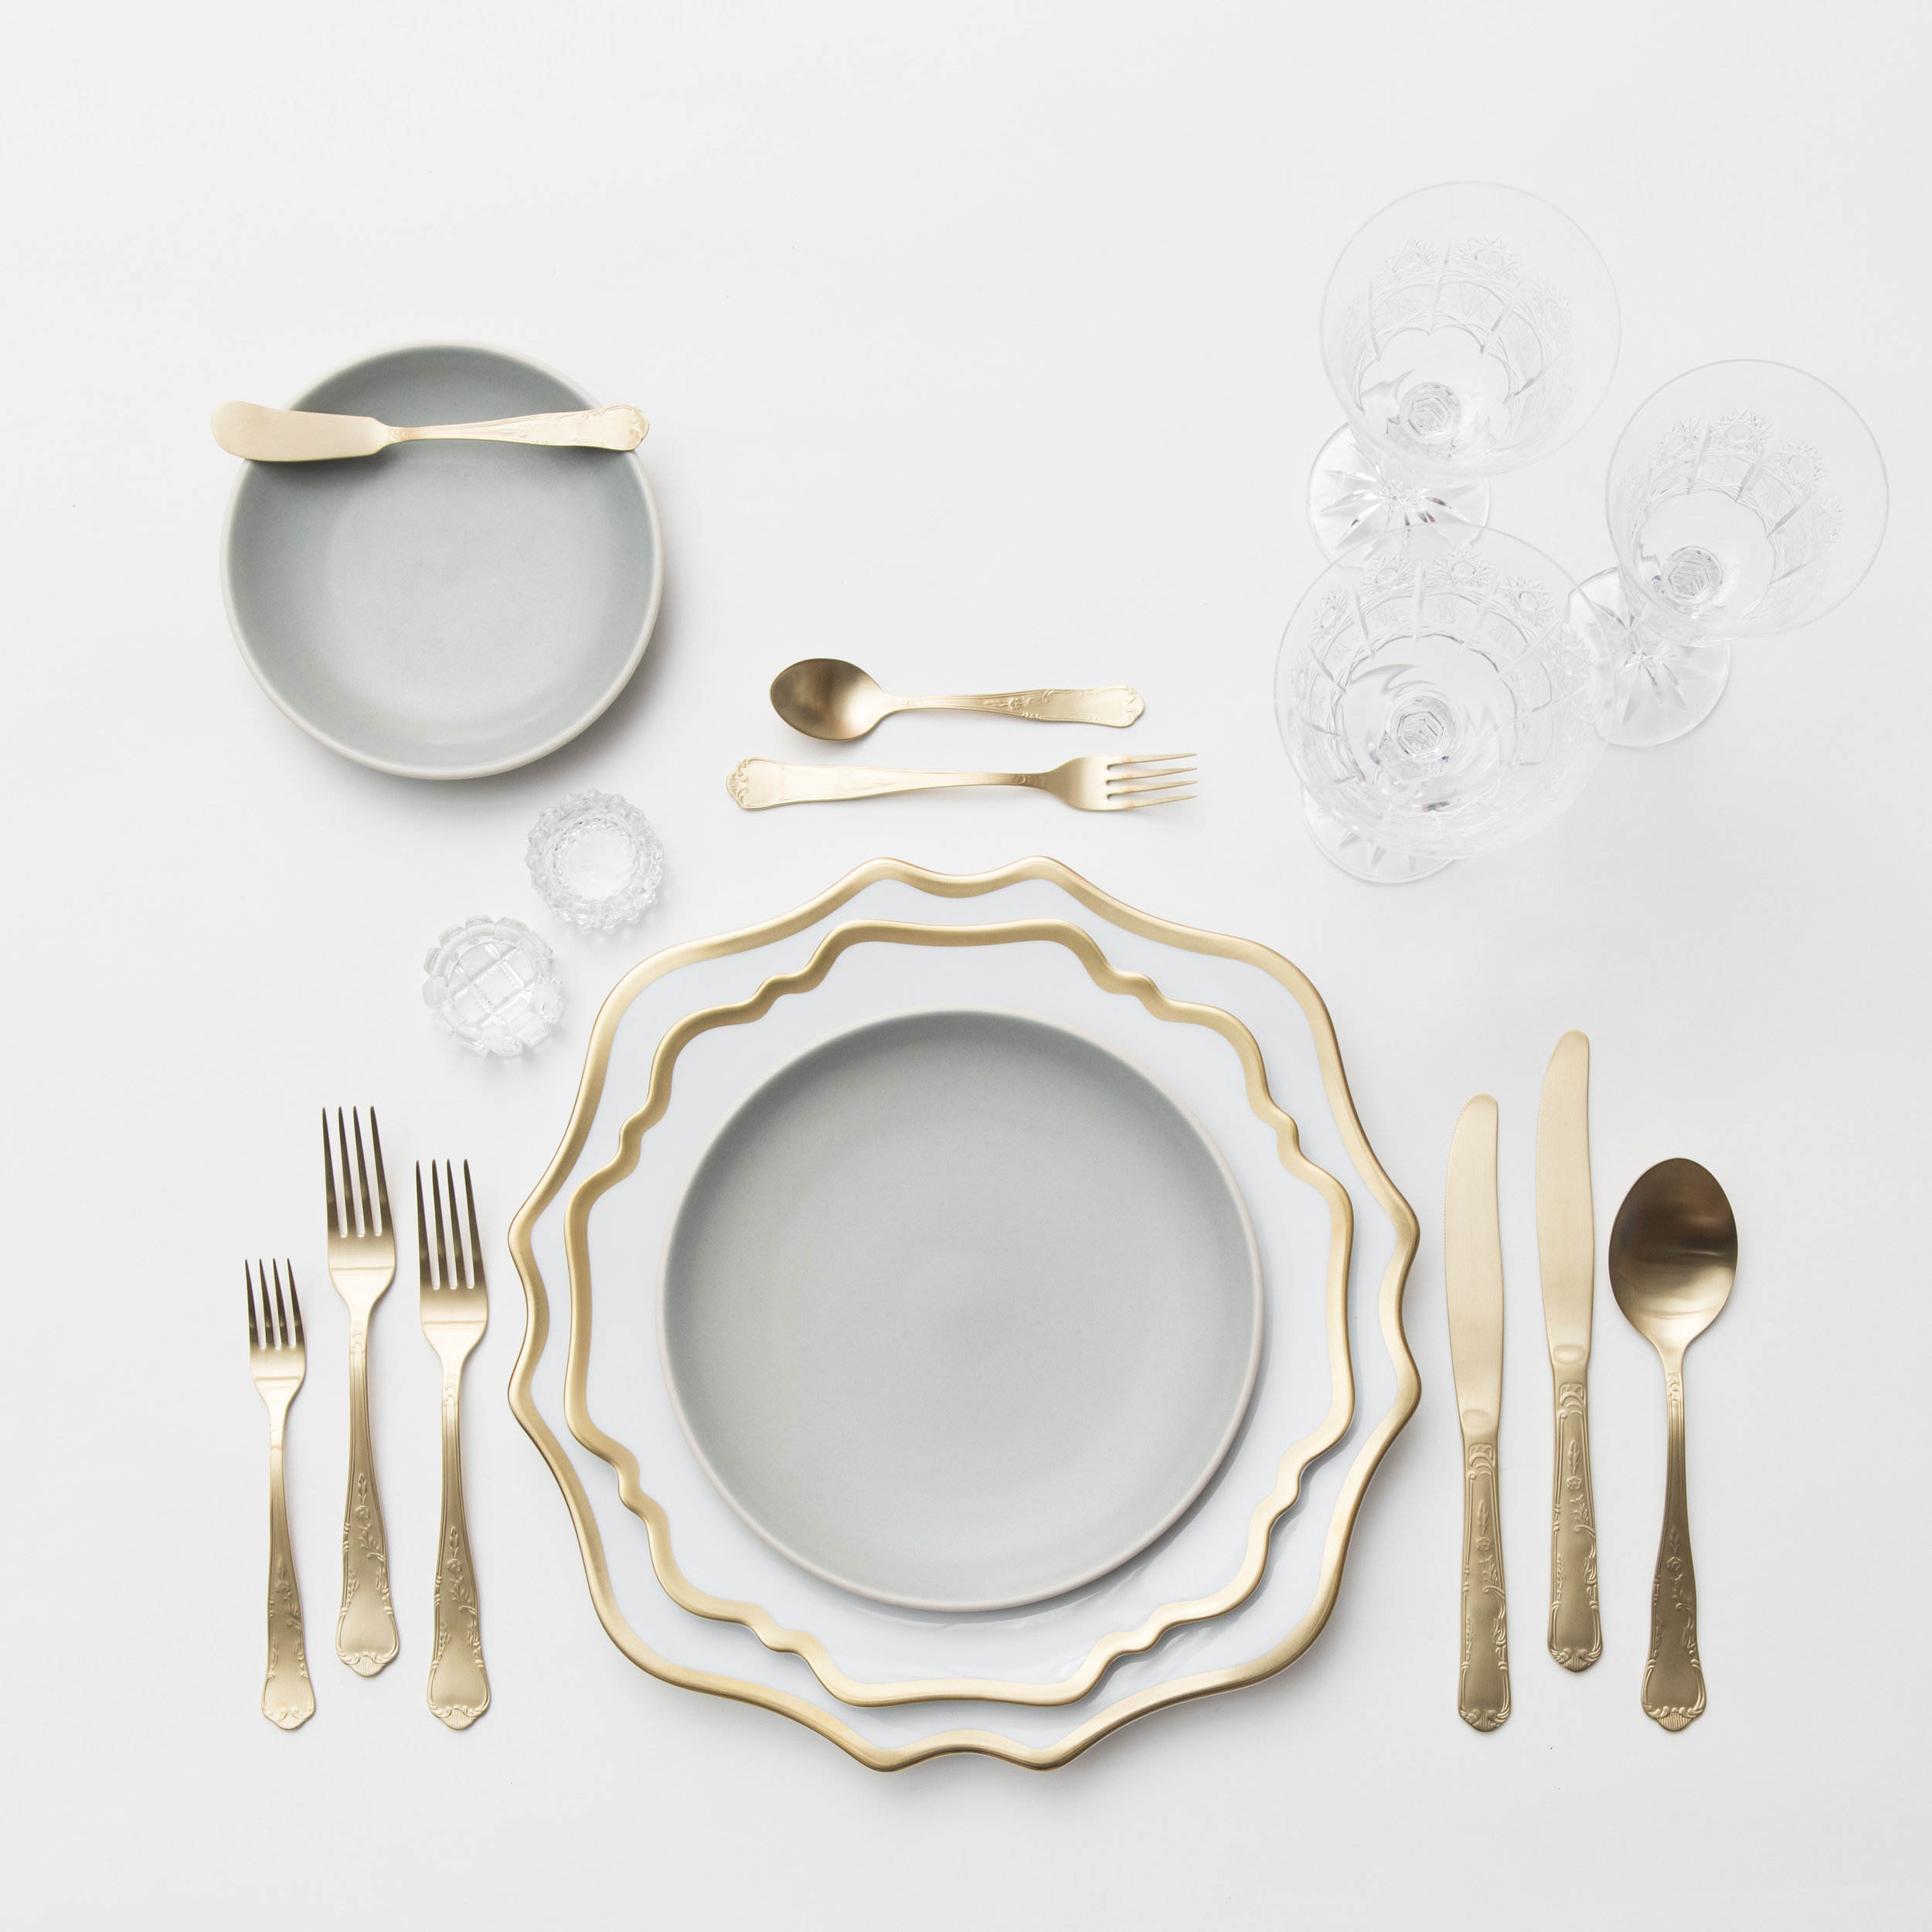 RENT: Anna Weatherley Chargers/Dinnerware in White/Gold + Heath Ceramics in Mist + Chateau Flatware in Matte Gold + Czech Crystal Stemware + Antique Crystal Salt Cellars  SHOP:Anna Weatherley Chargers/Dinnerware in White/Gold